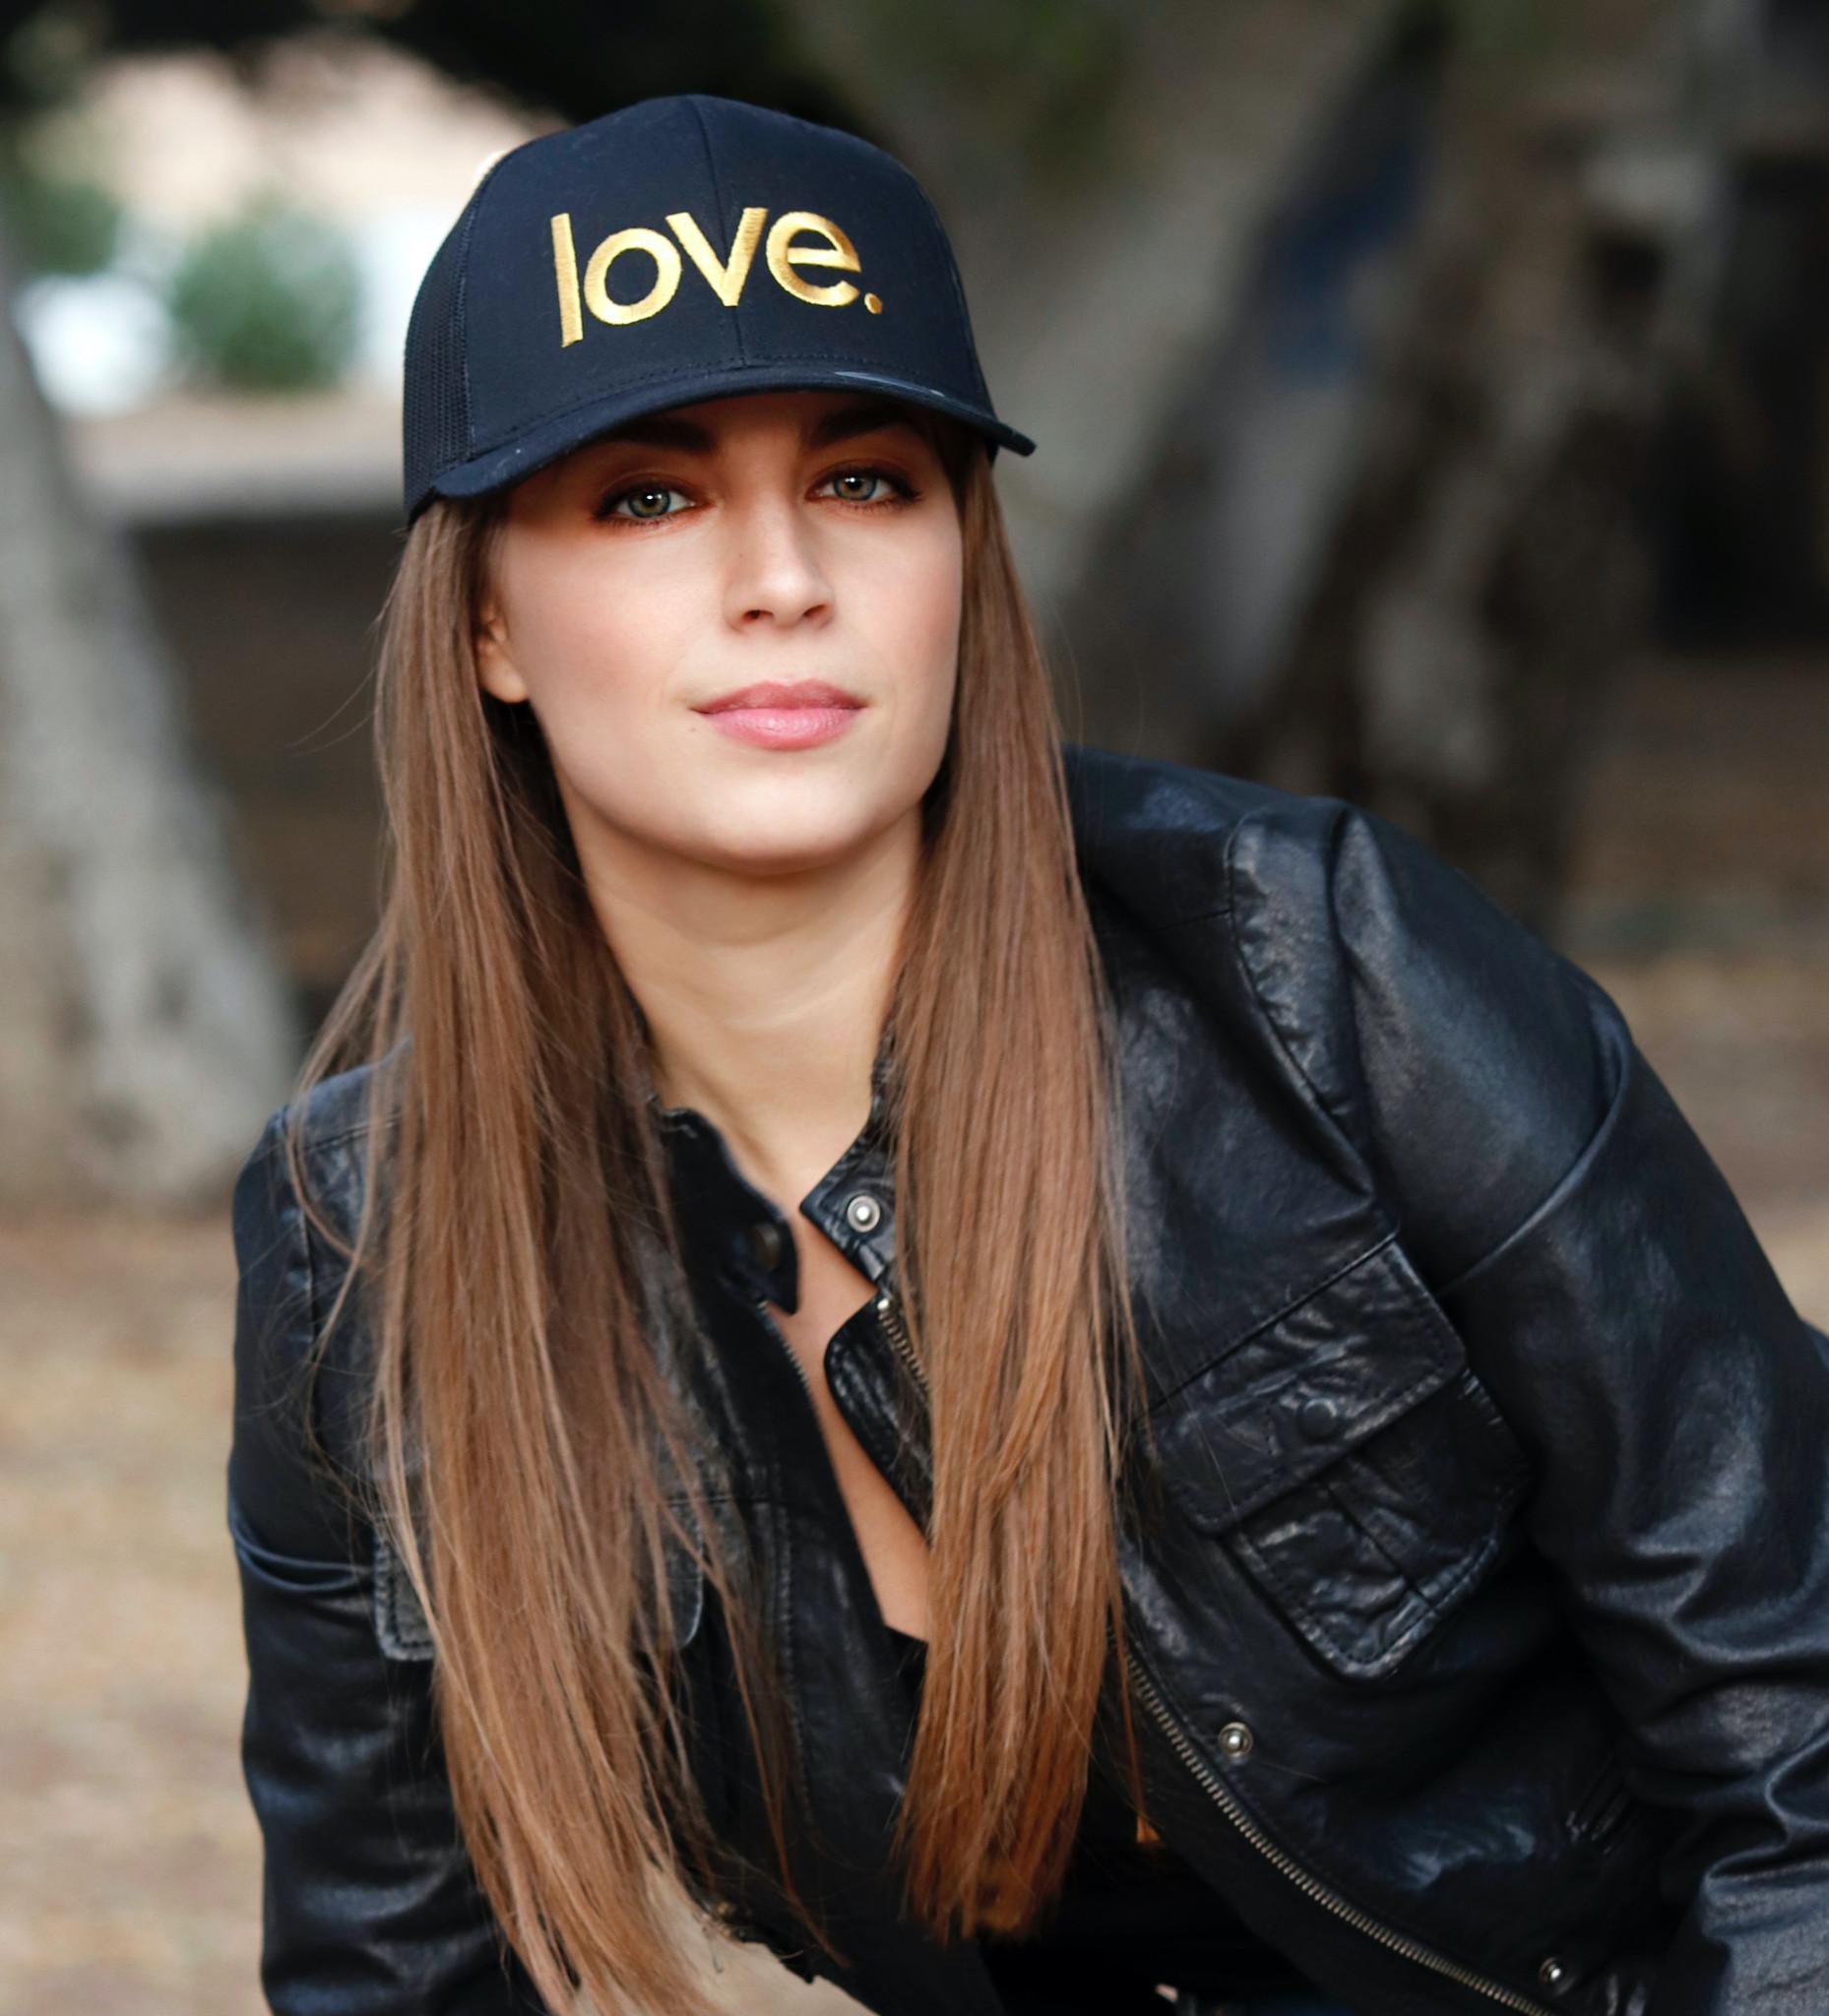 LOVE. EMBROIDERED TRUCKER HAT (Black/Gold)